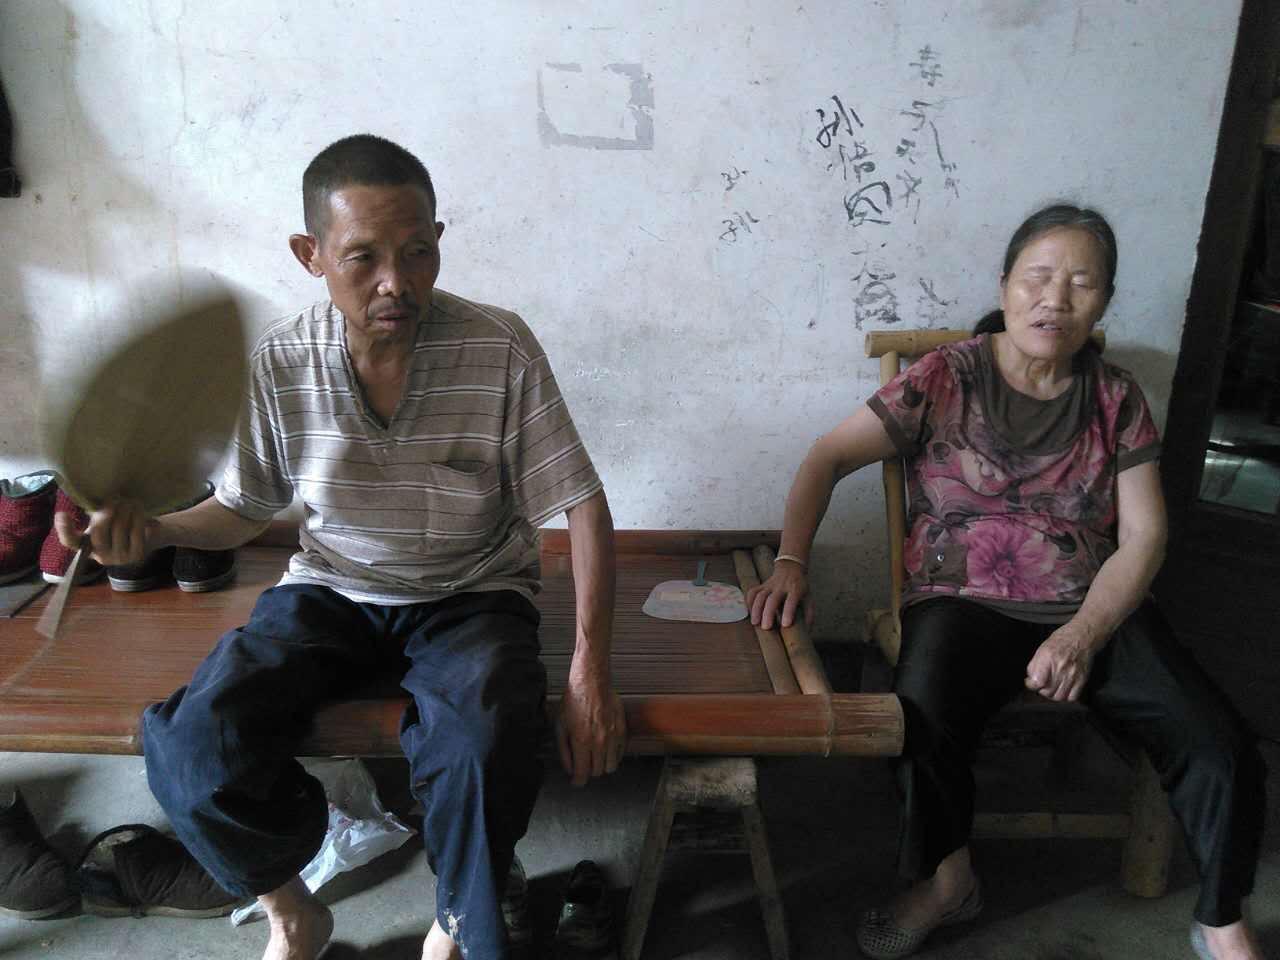 刘嘉青父母